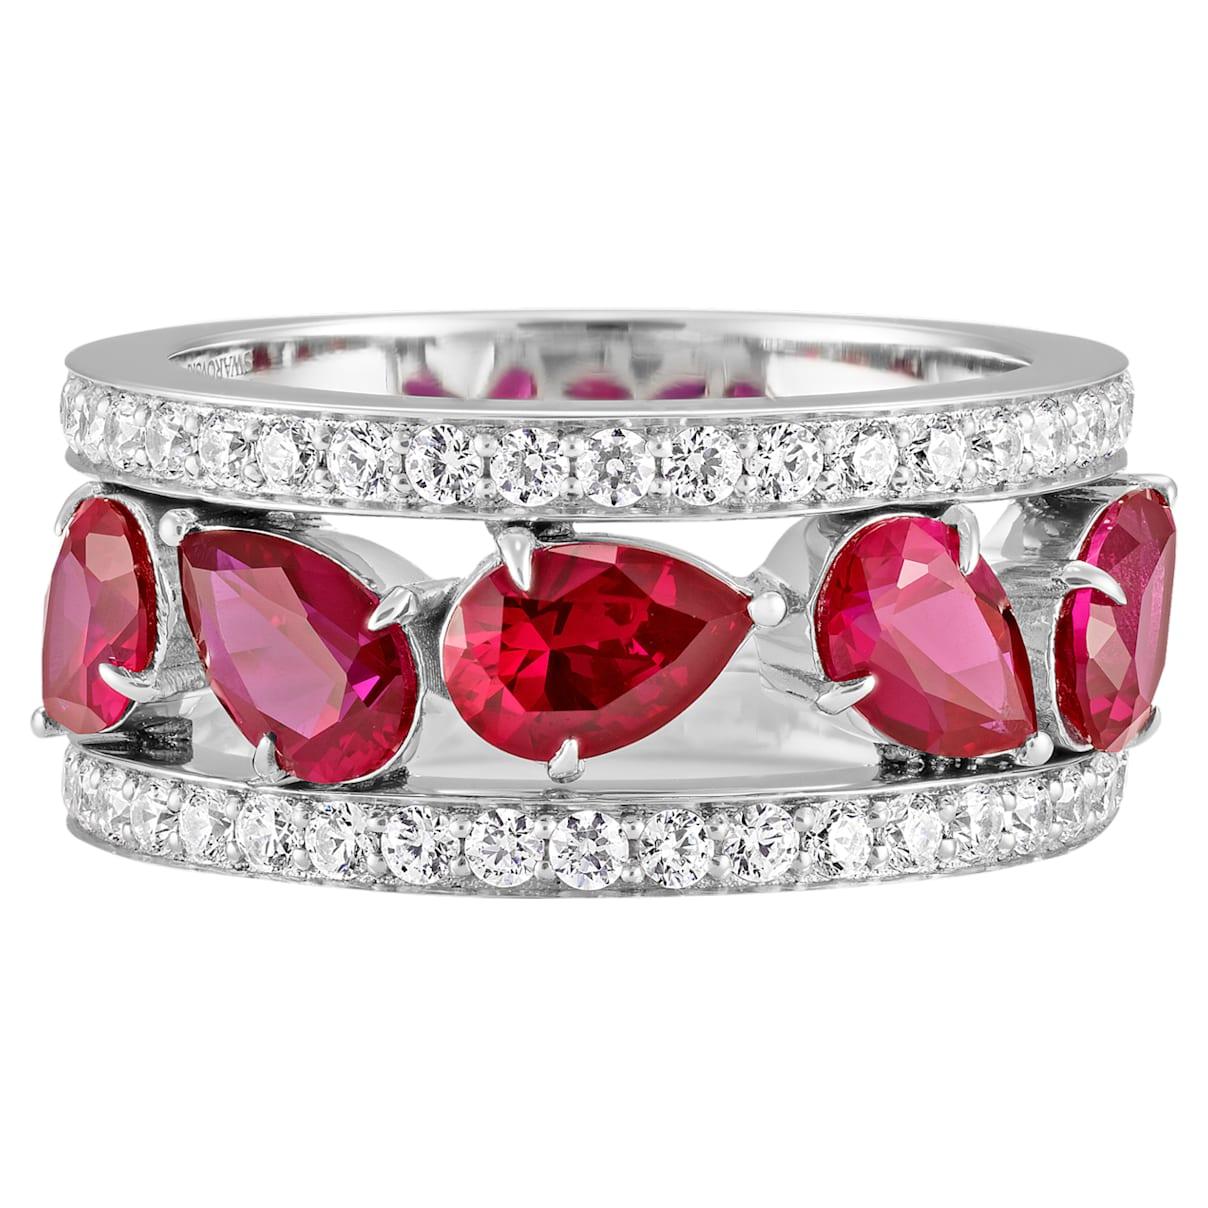 Lola Wide Band Ring, Swarovski Created Rubies, 18K White Gold, Size 58